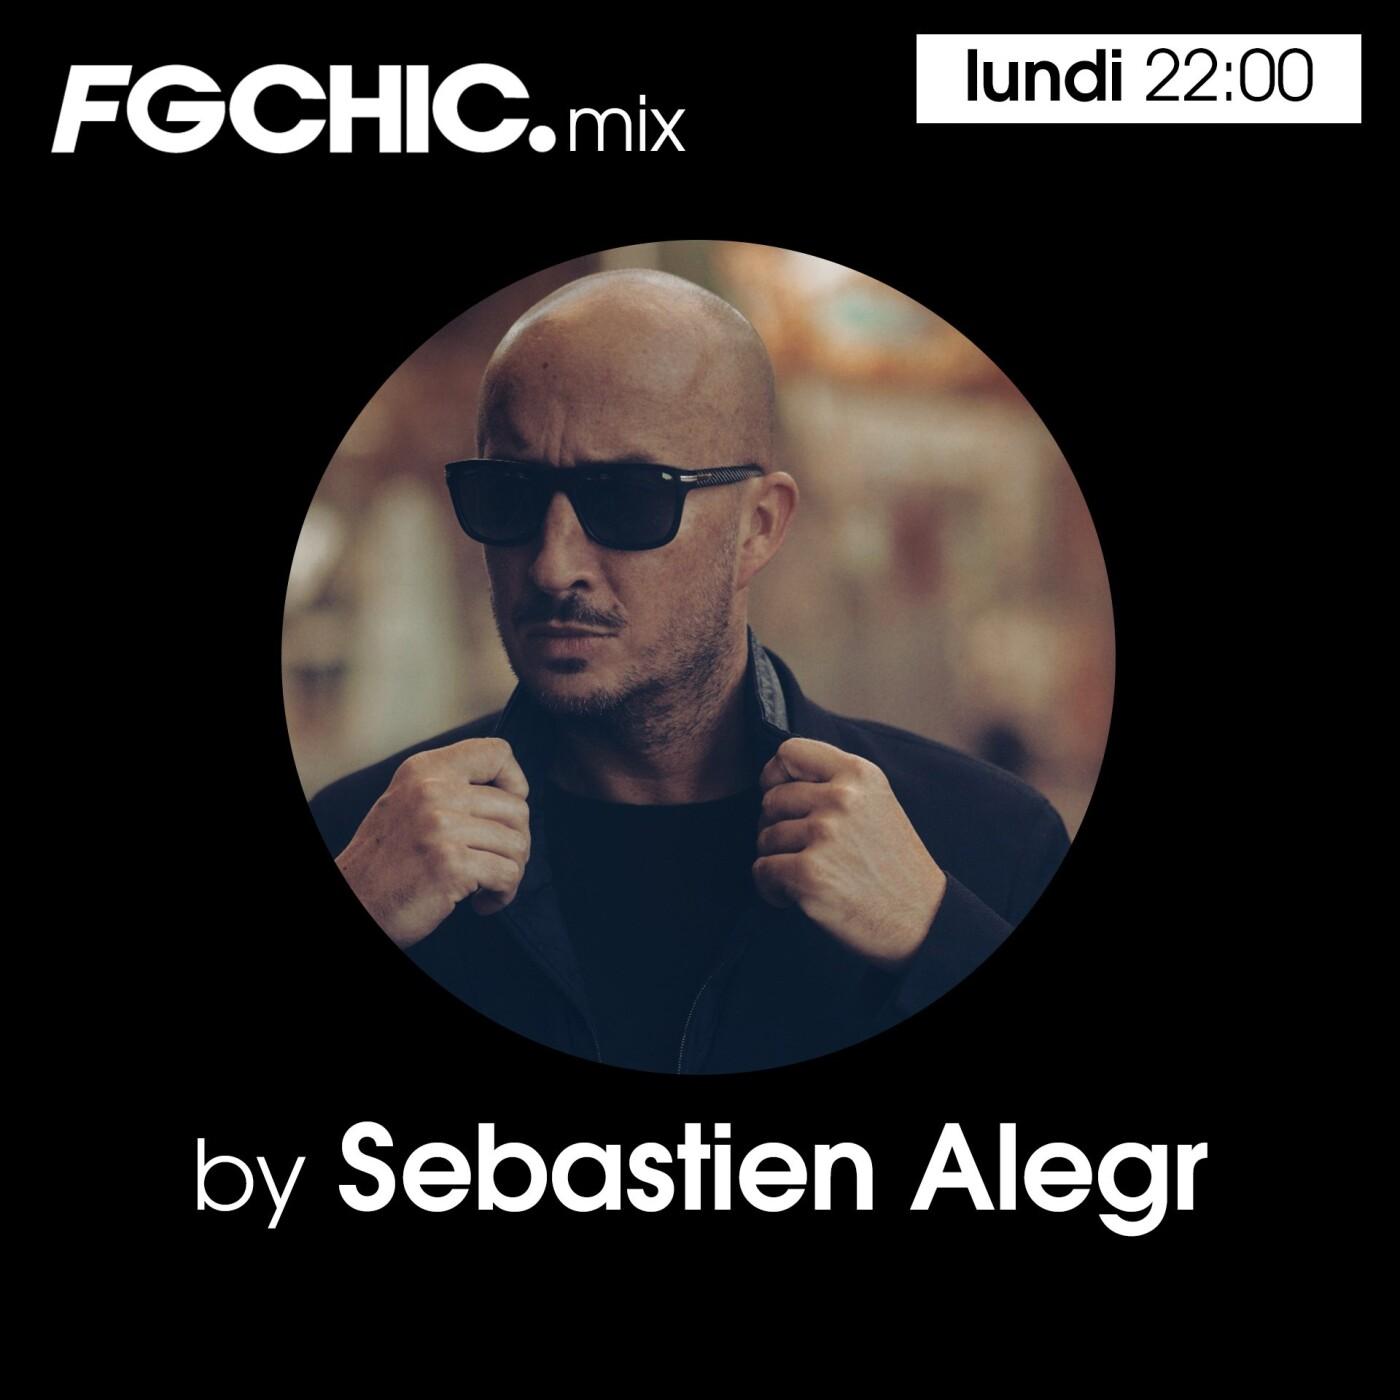 FG CHIC MIX BY SEBASTIEN ALEGR